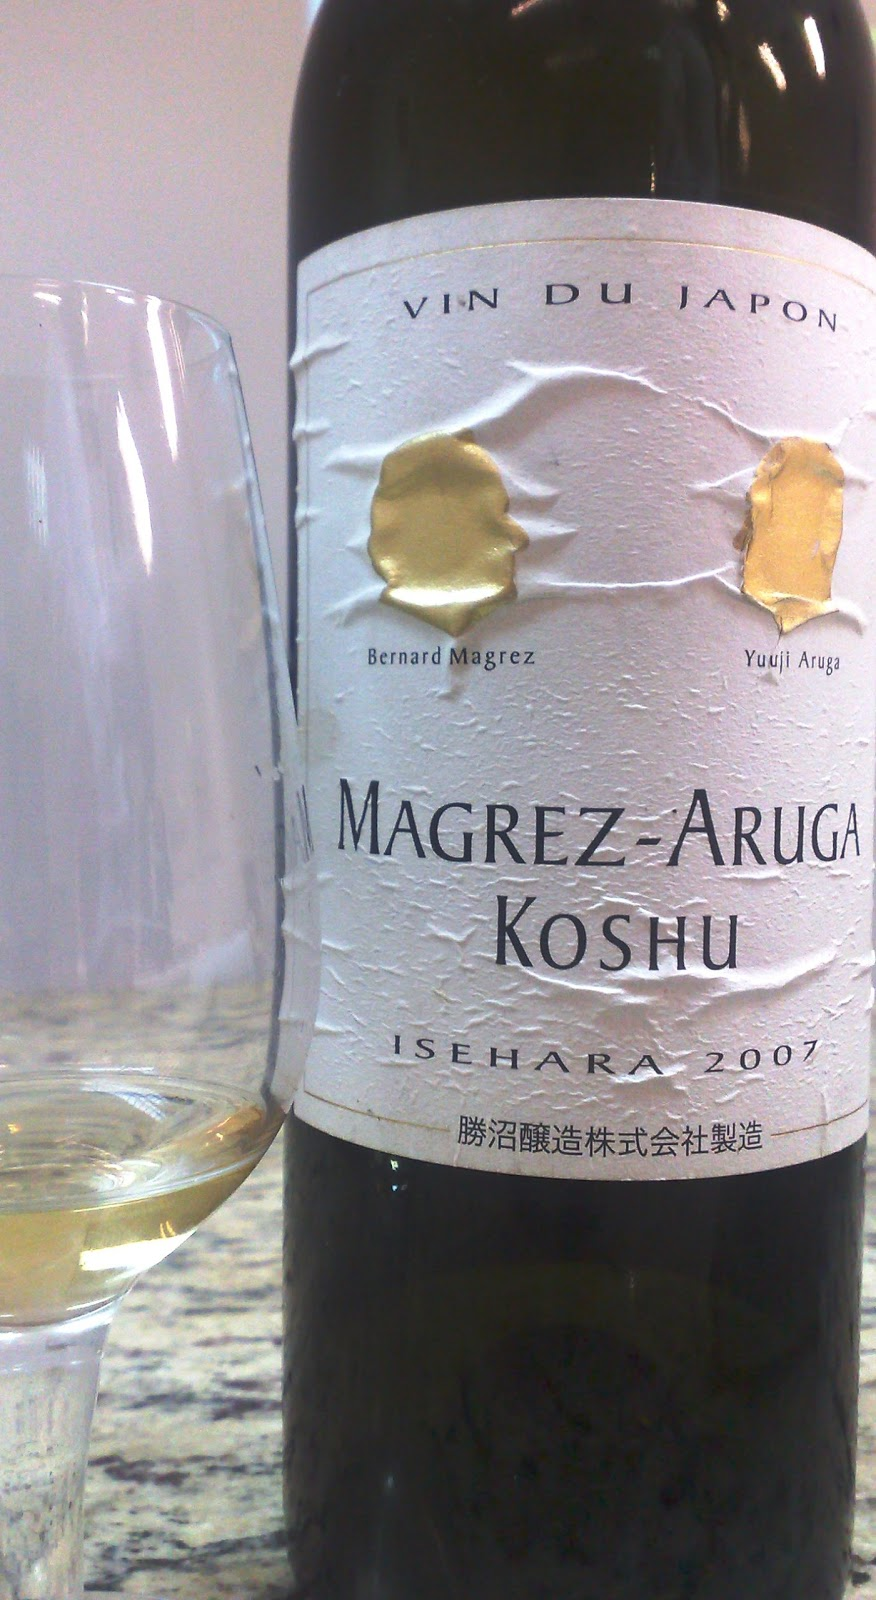 Procurando Japonês Que Fale Portugues Corona-8982